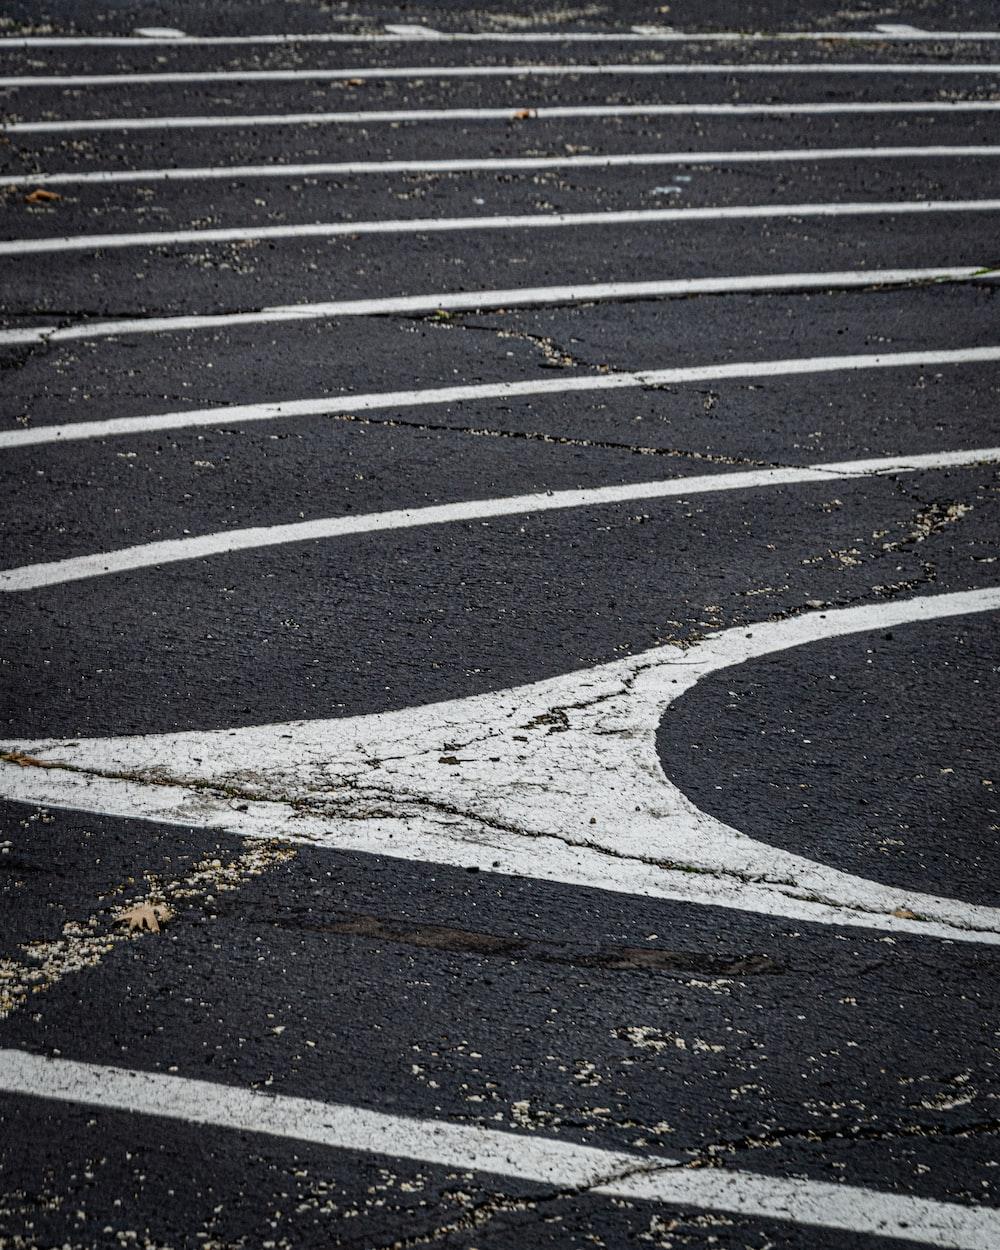 white and black pedestrian line